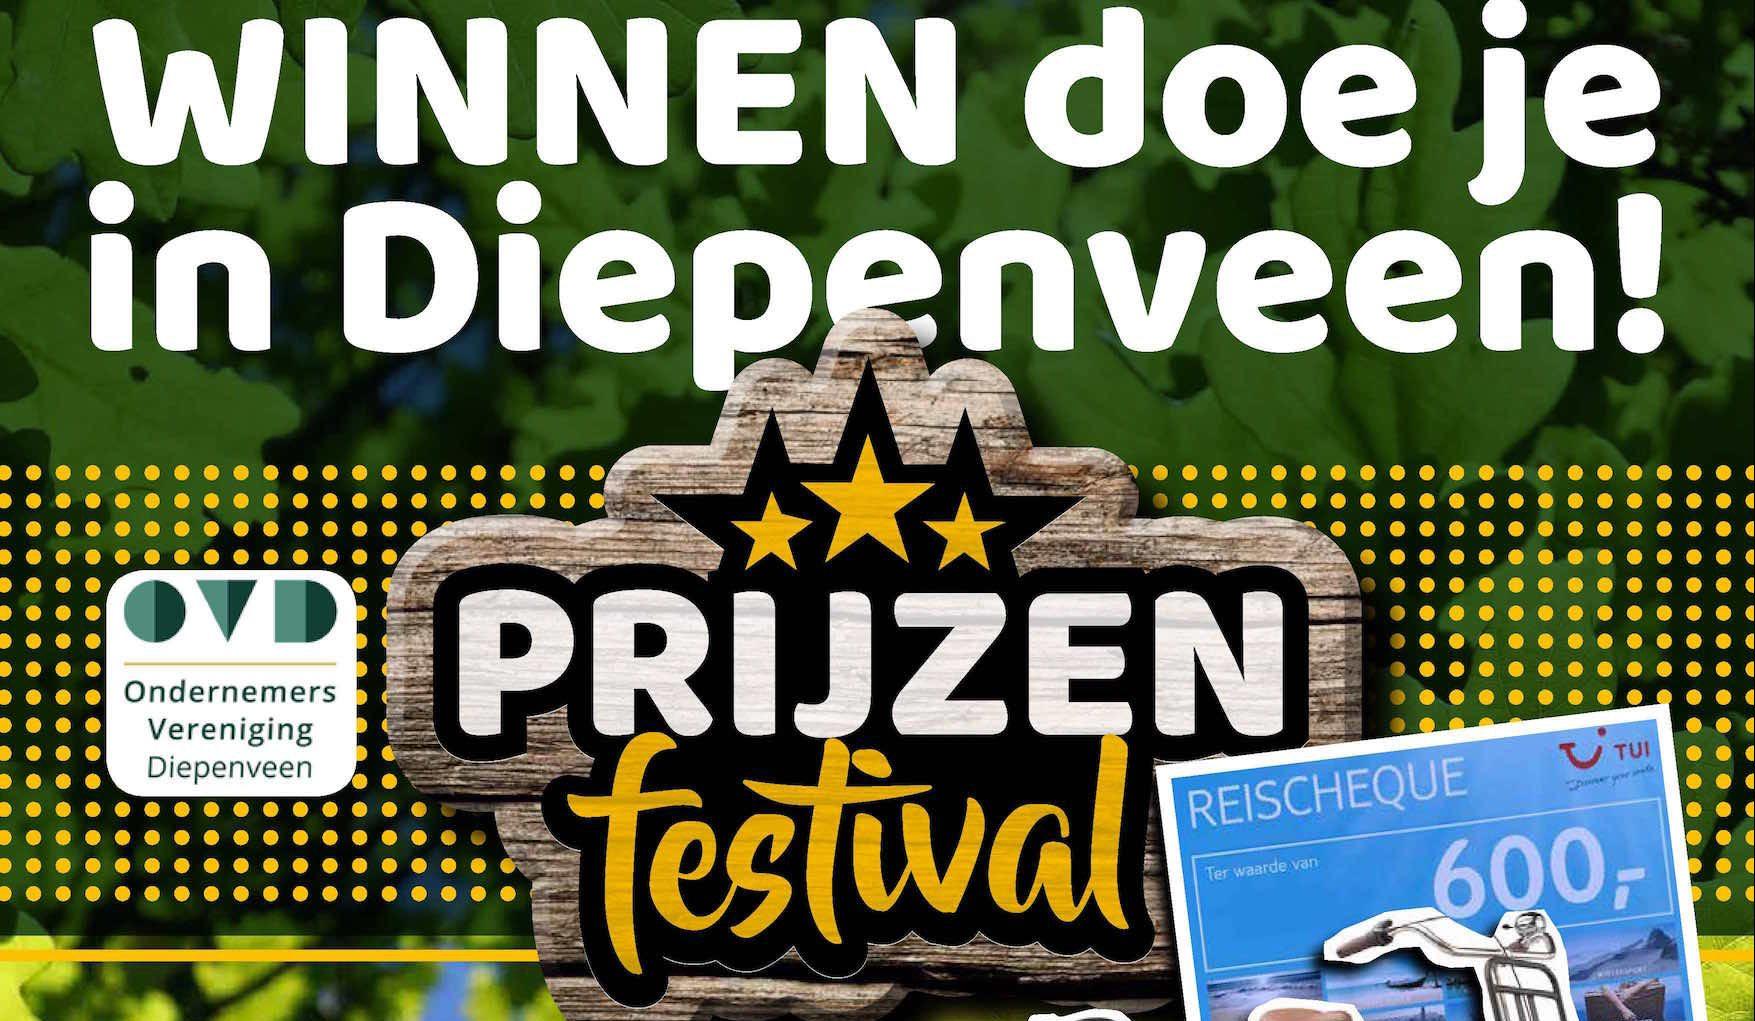 Advertentie Prijzen festival verkleind [2]